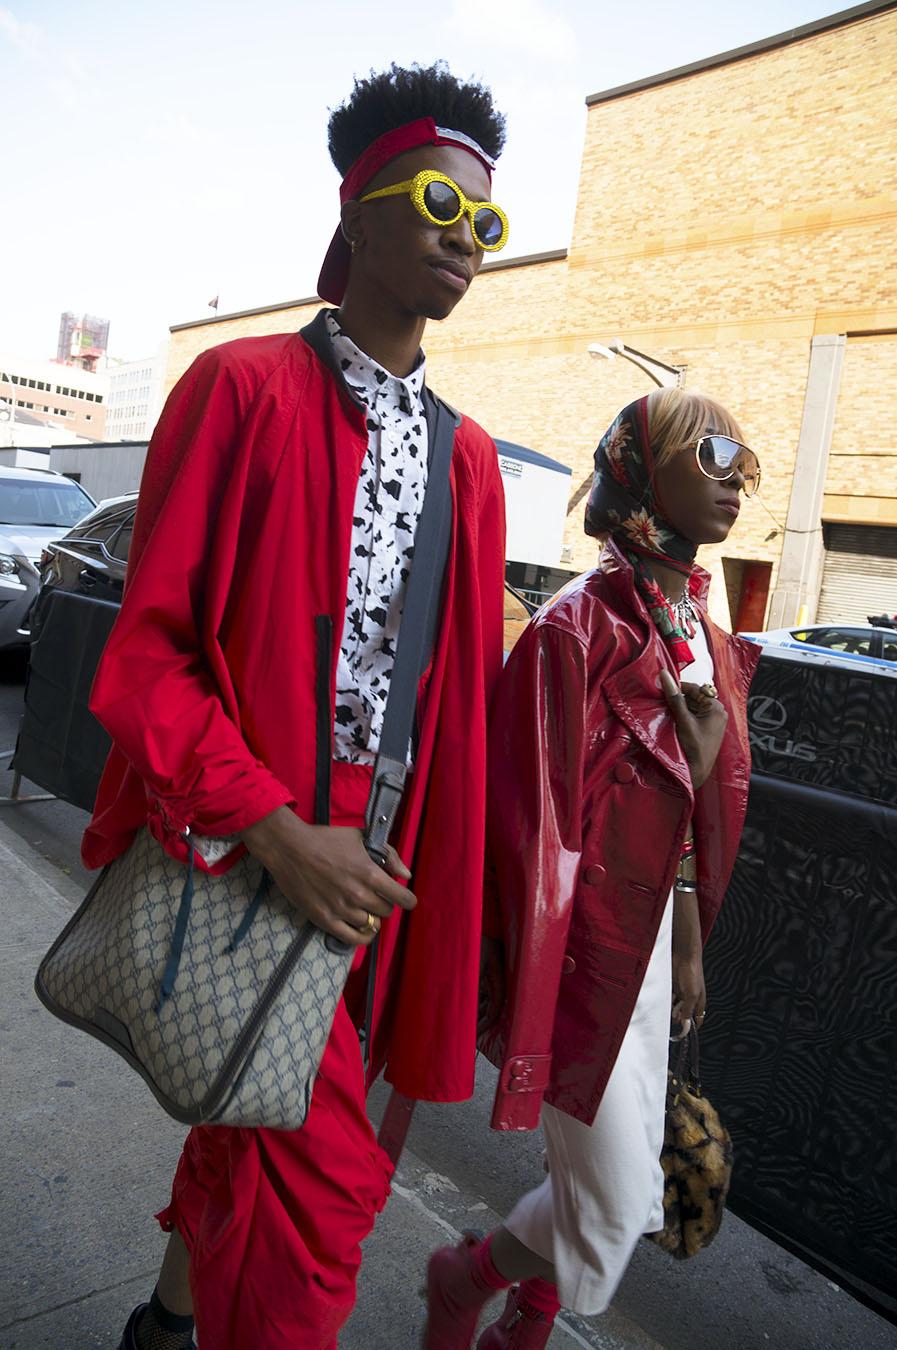 Noa_Baker_street_fashion_photography_new_york